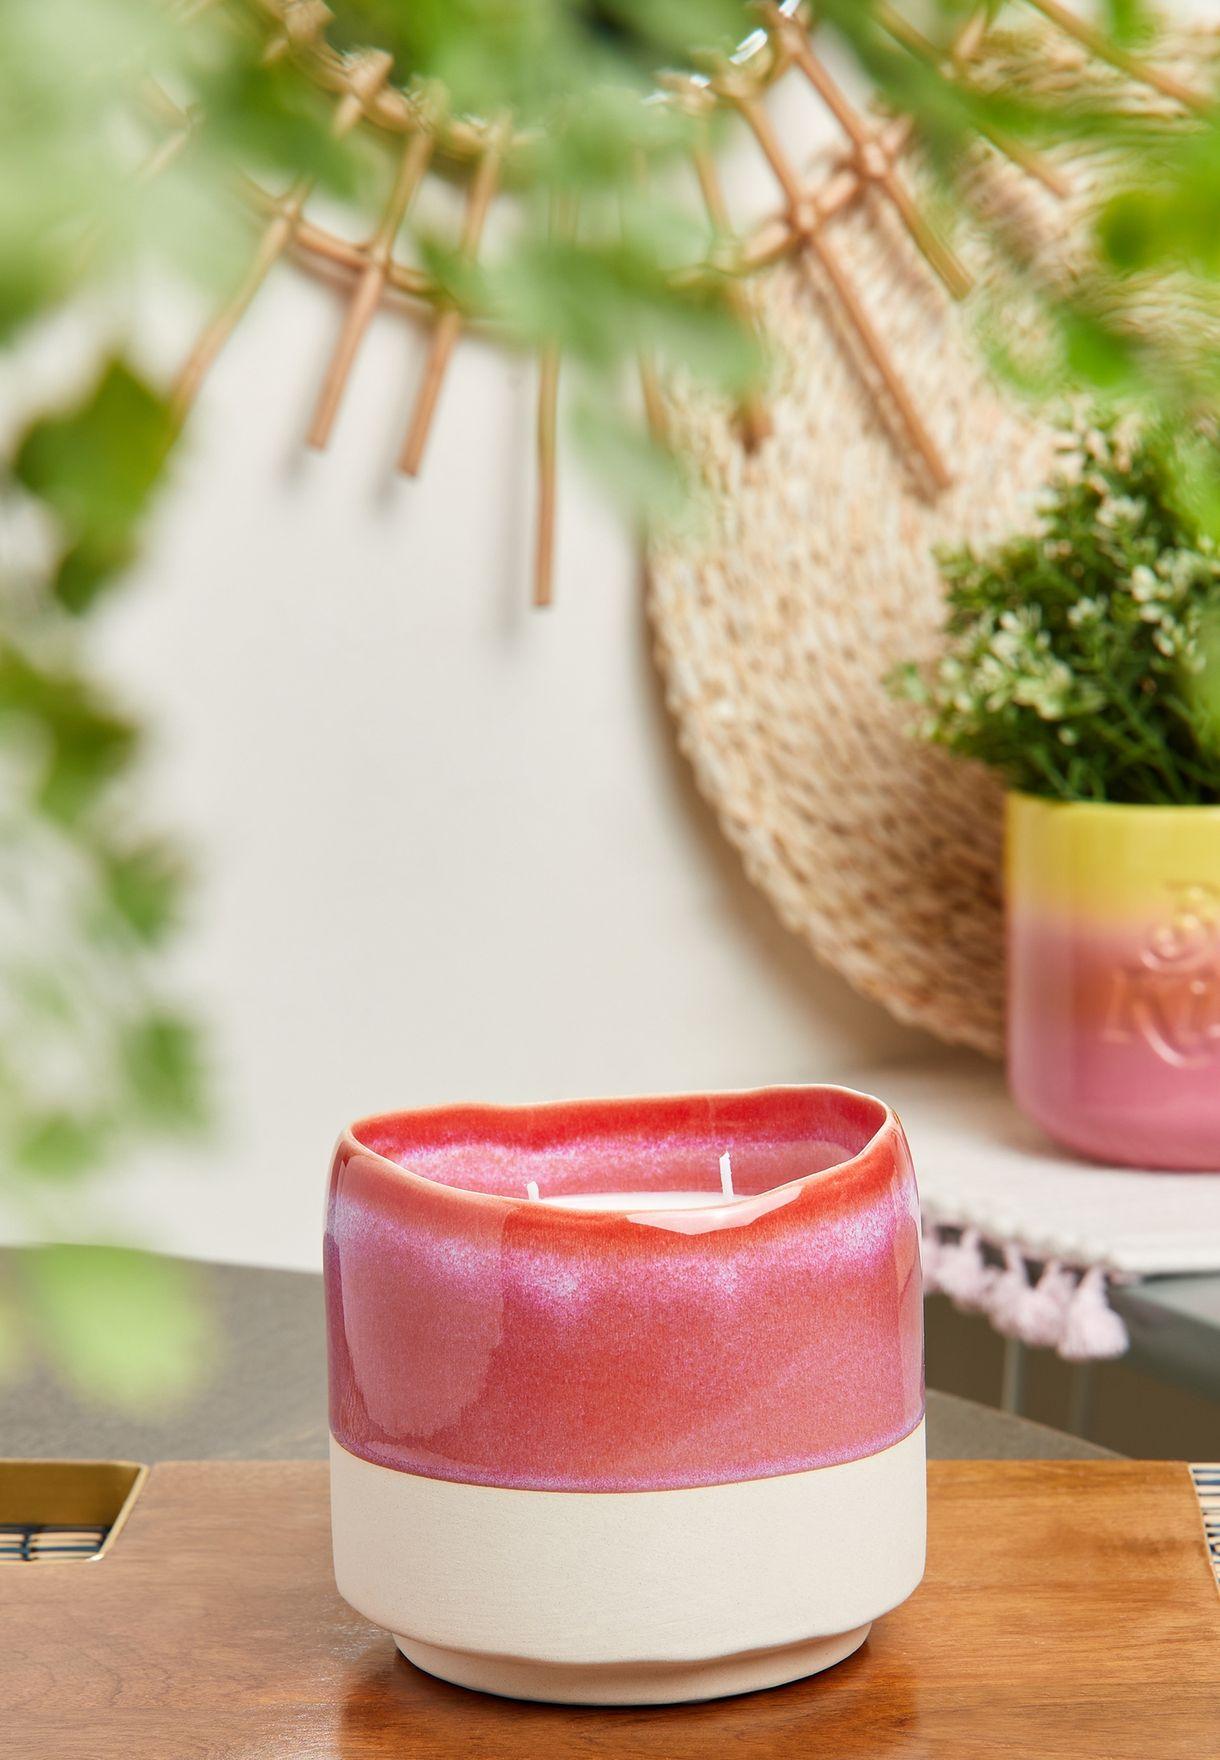 Vanilla Macaron & Berry Serenity Candle